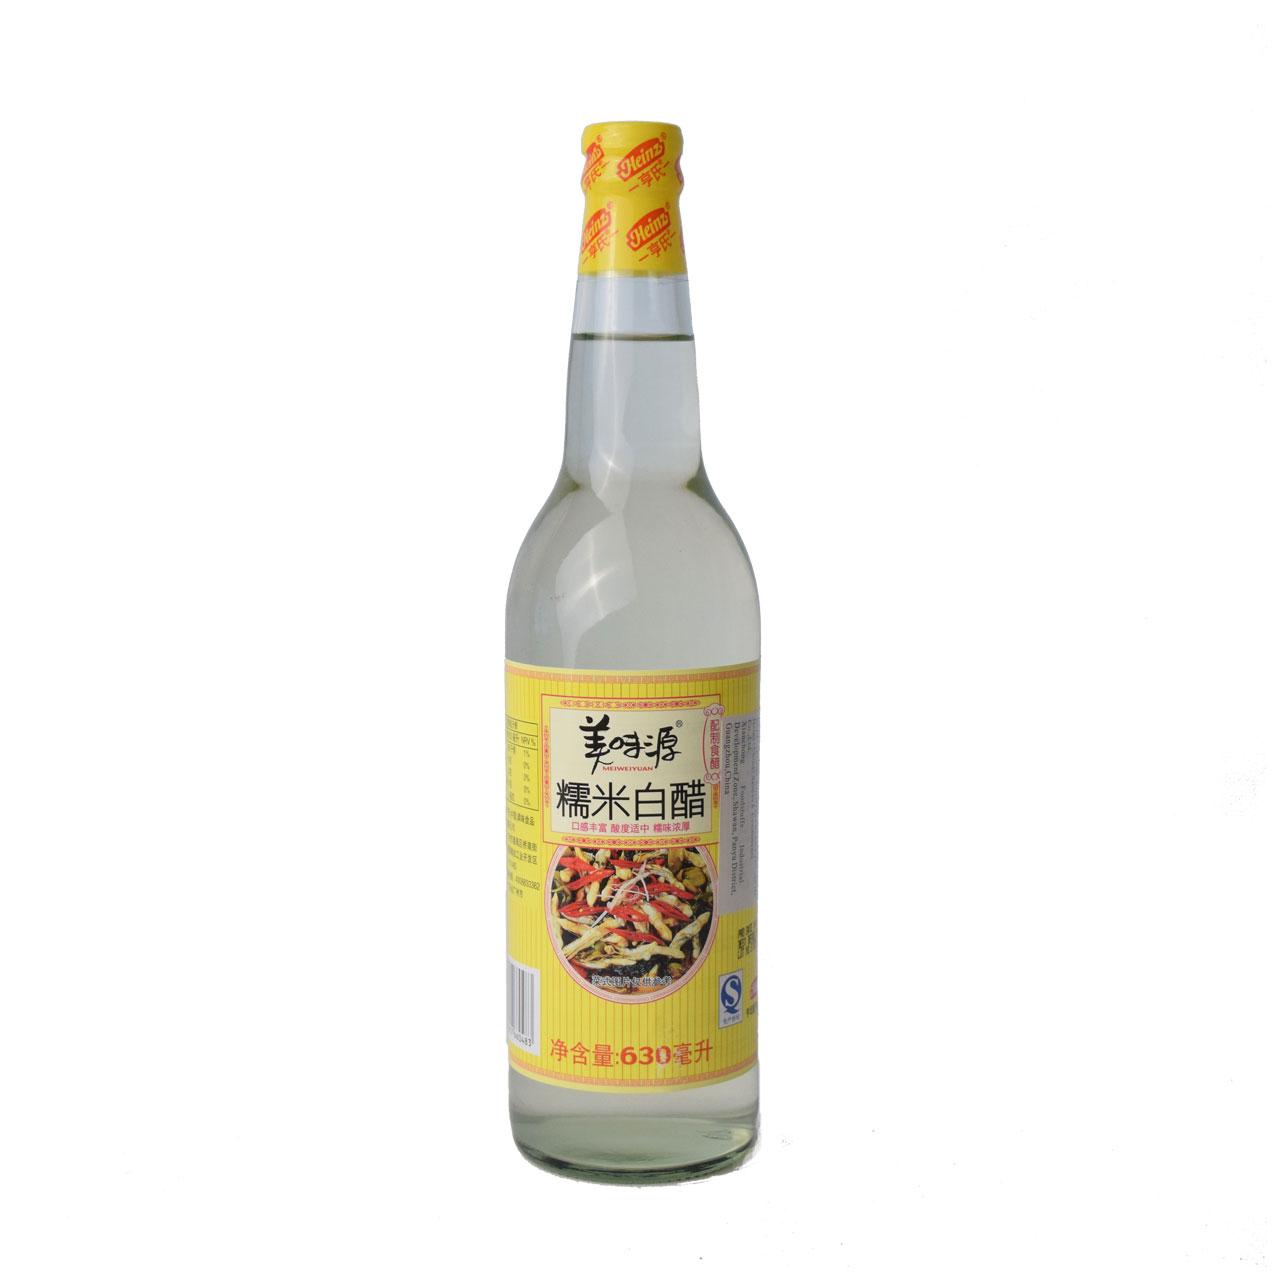 سرکه برنج سفید  ۶۳۰ml